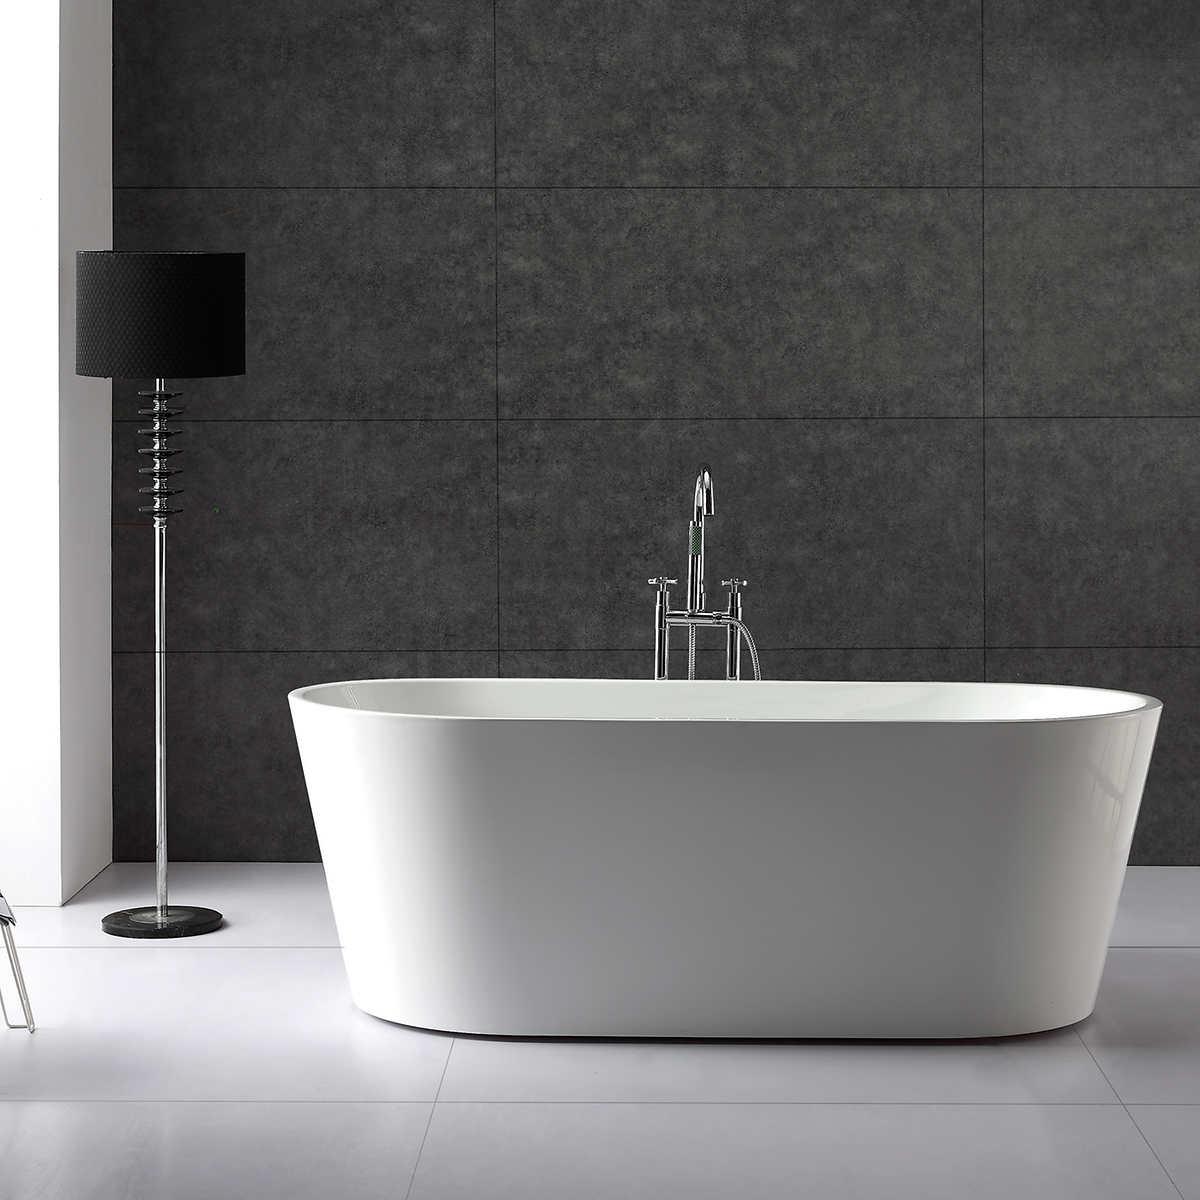 bathtubs  costco - barcelona freestanding tub by jade